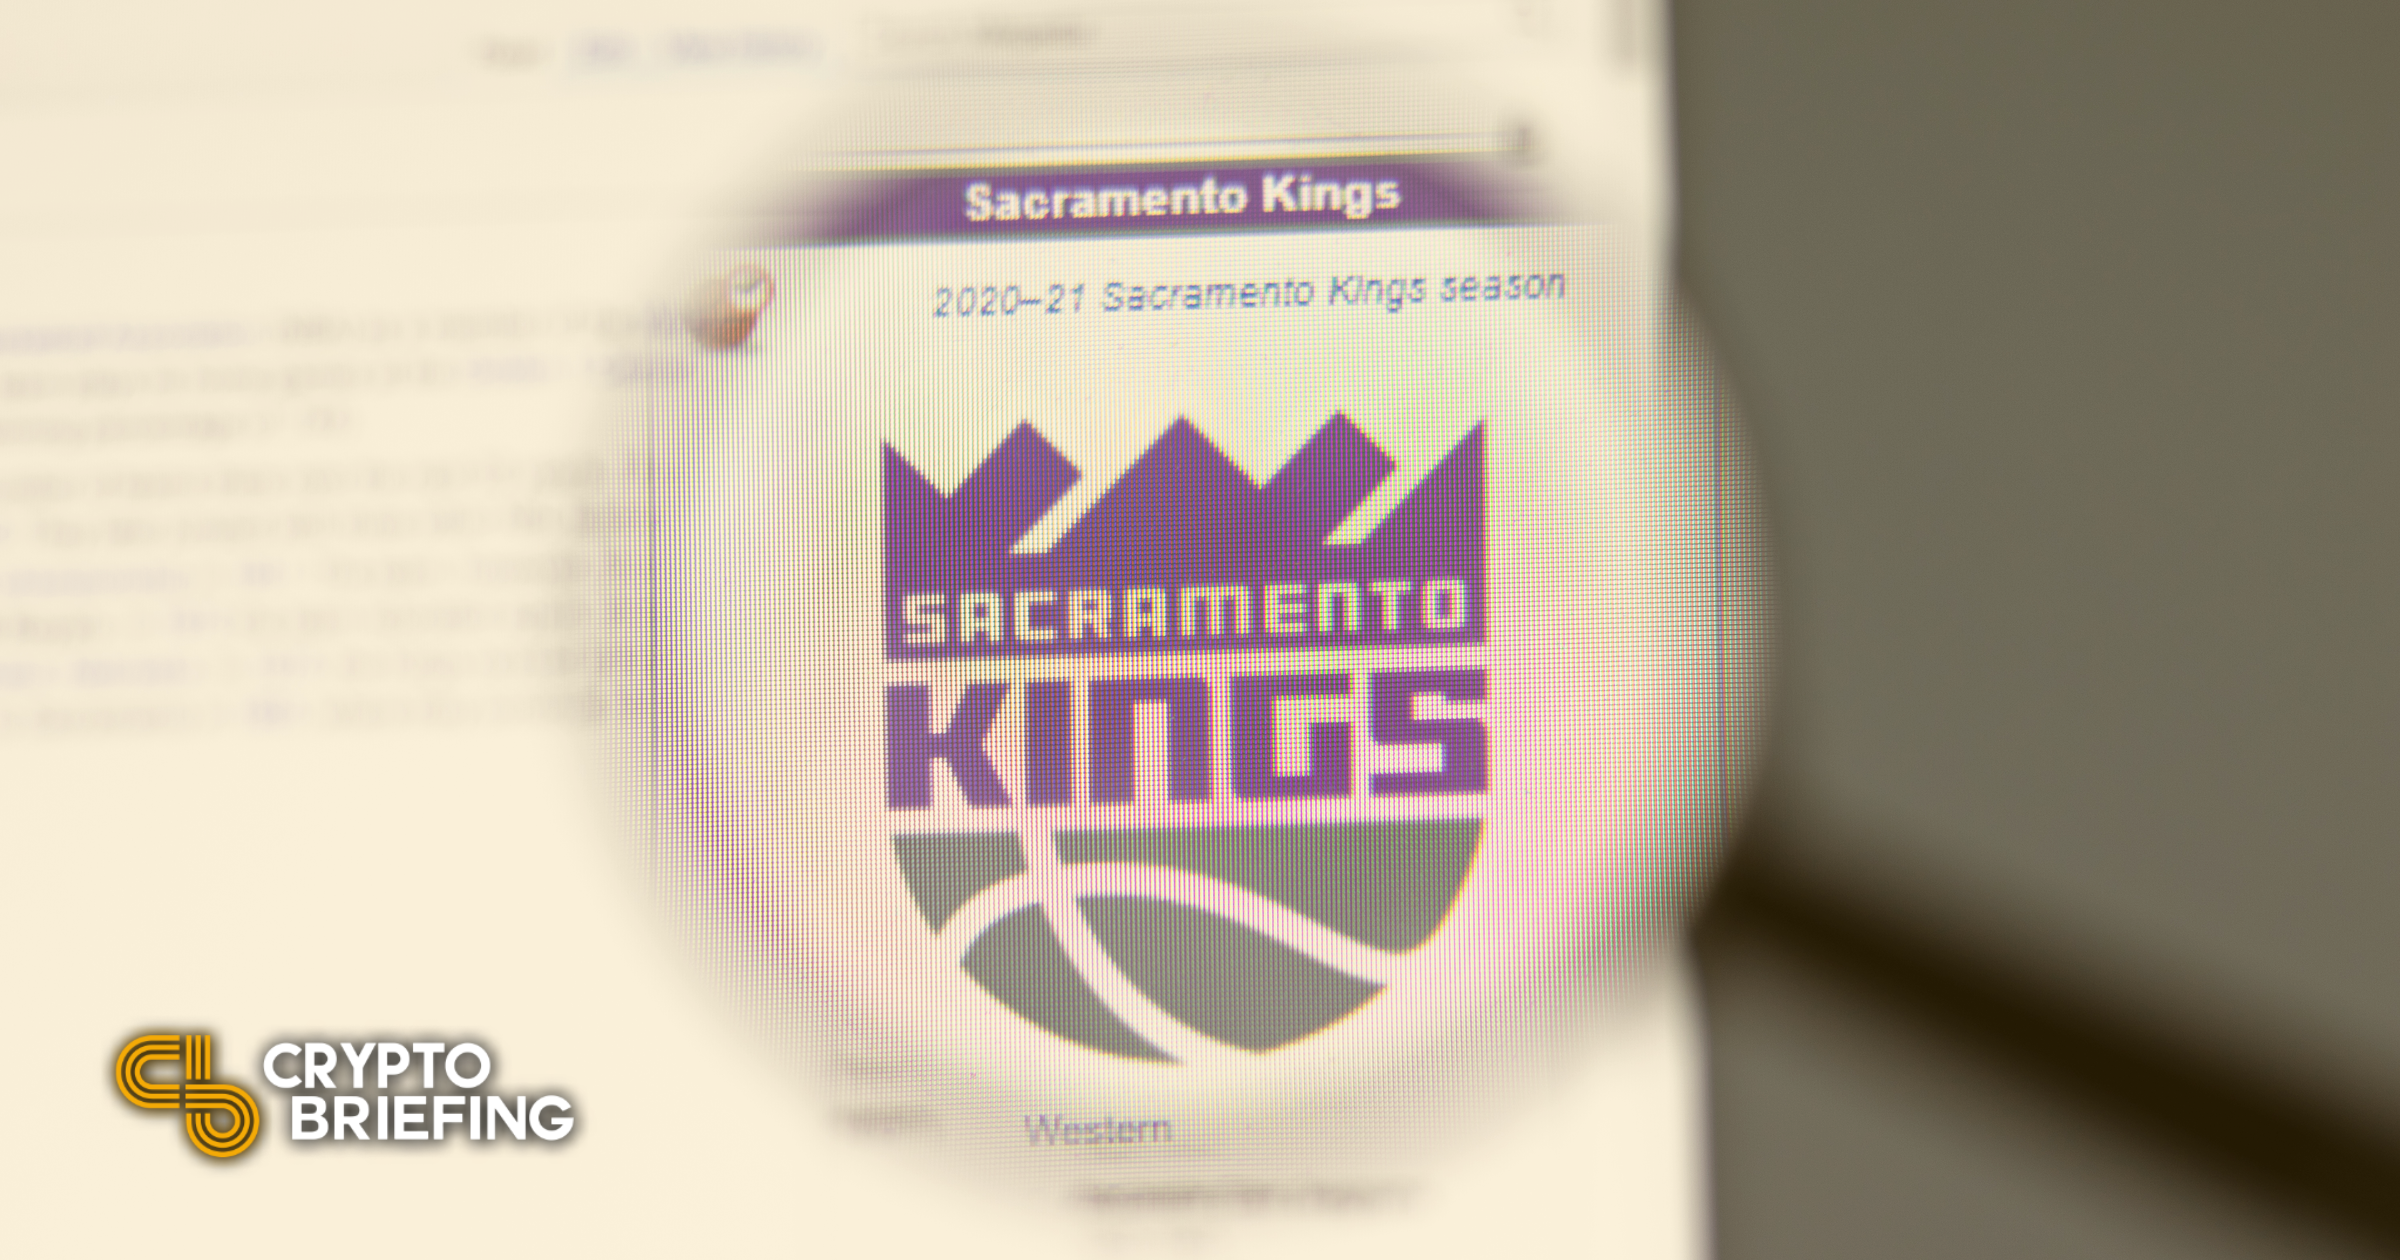 Sacramento Kings to Offer Bitcoin Salaries to Players, Staff